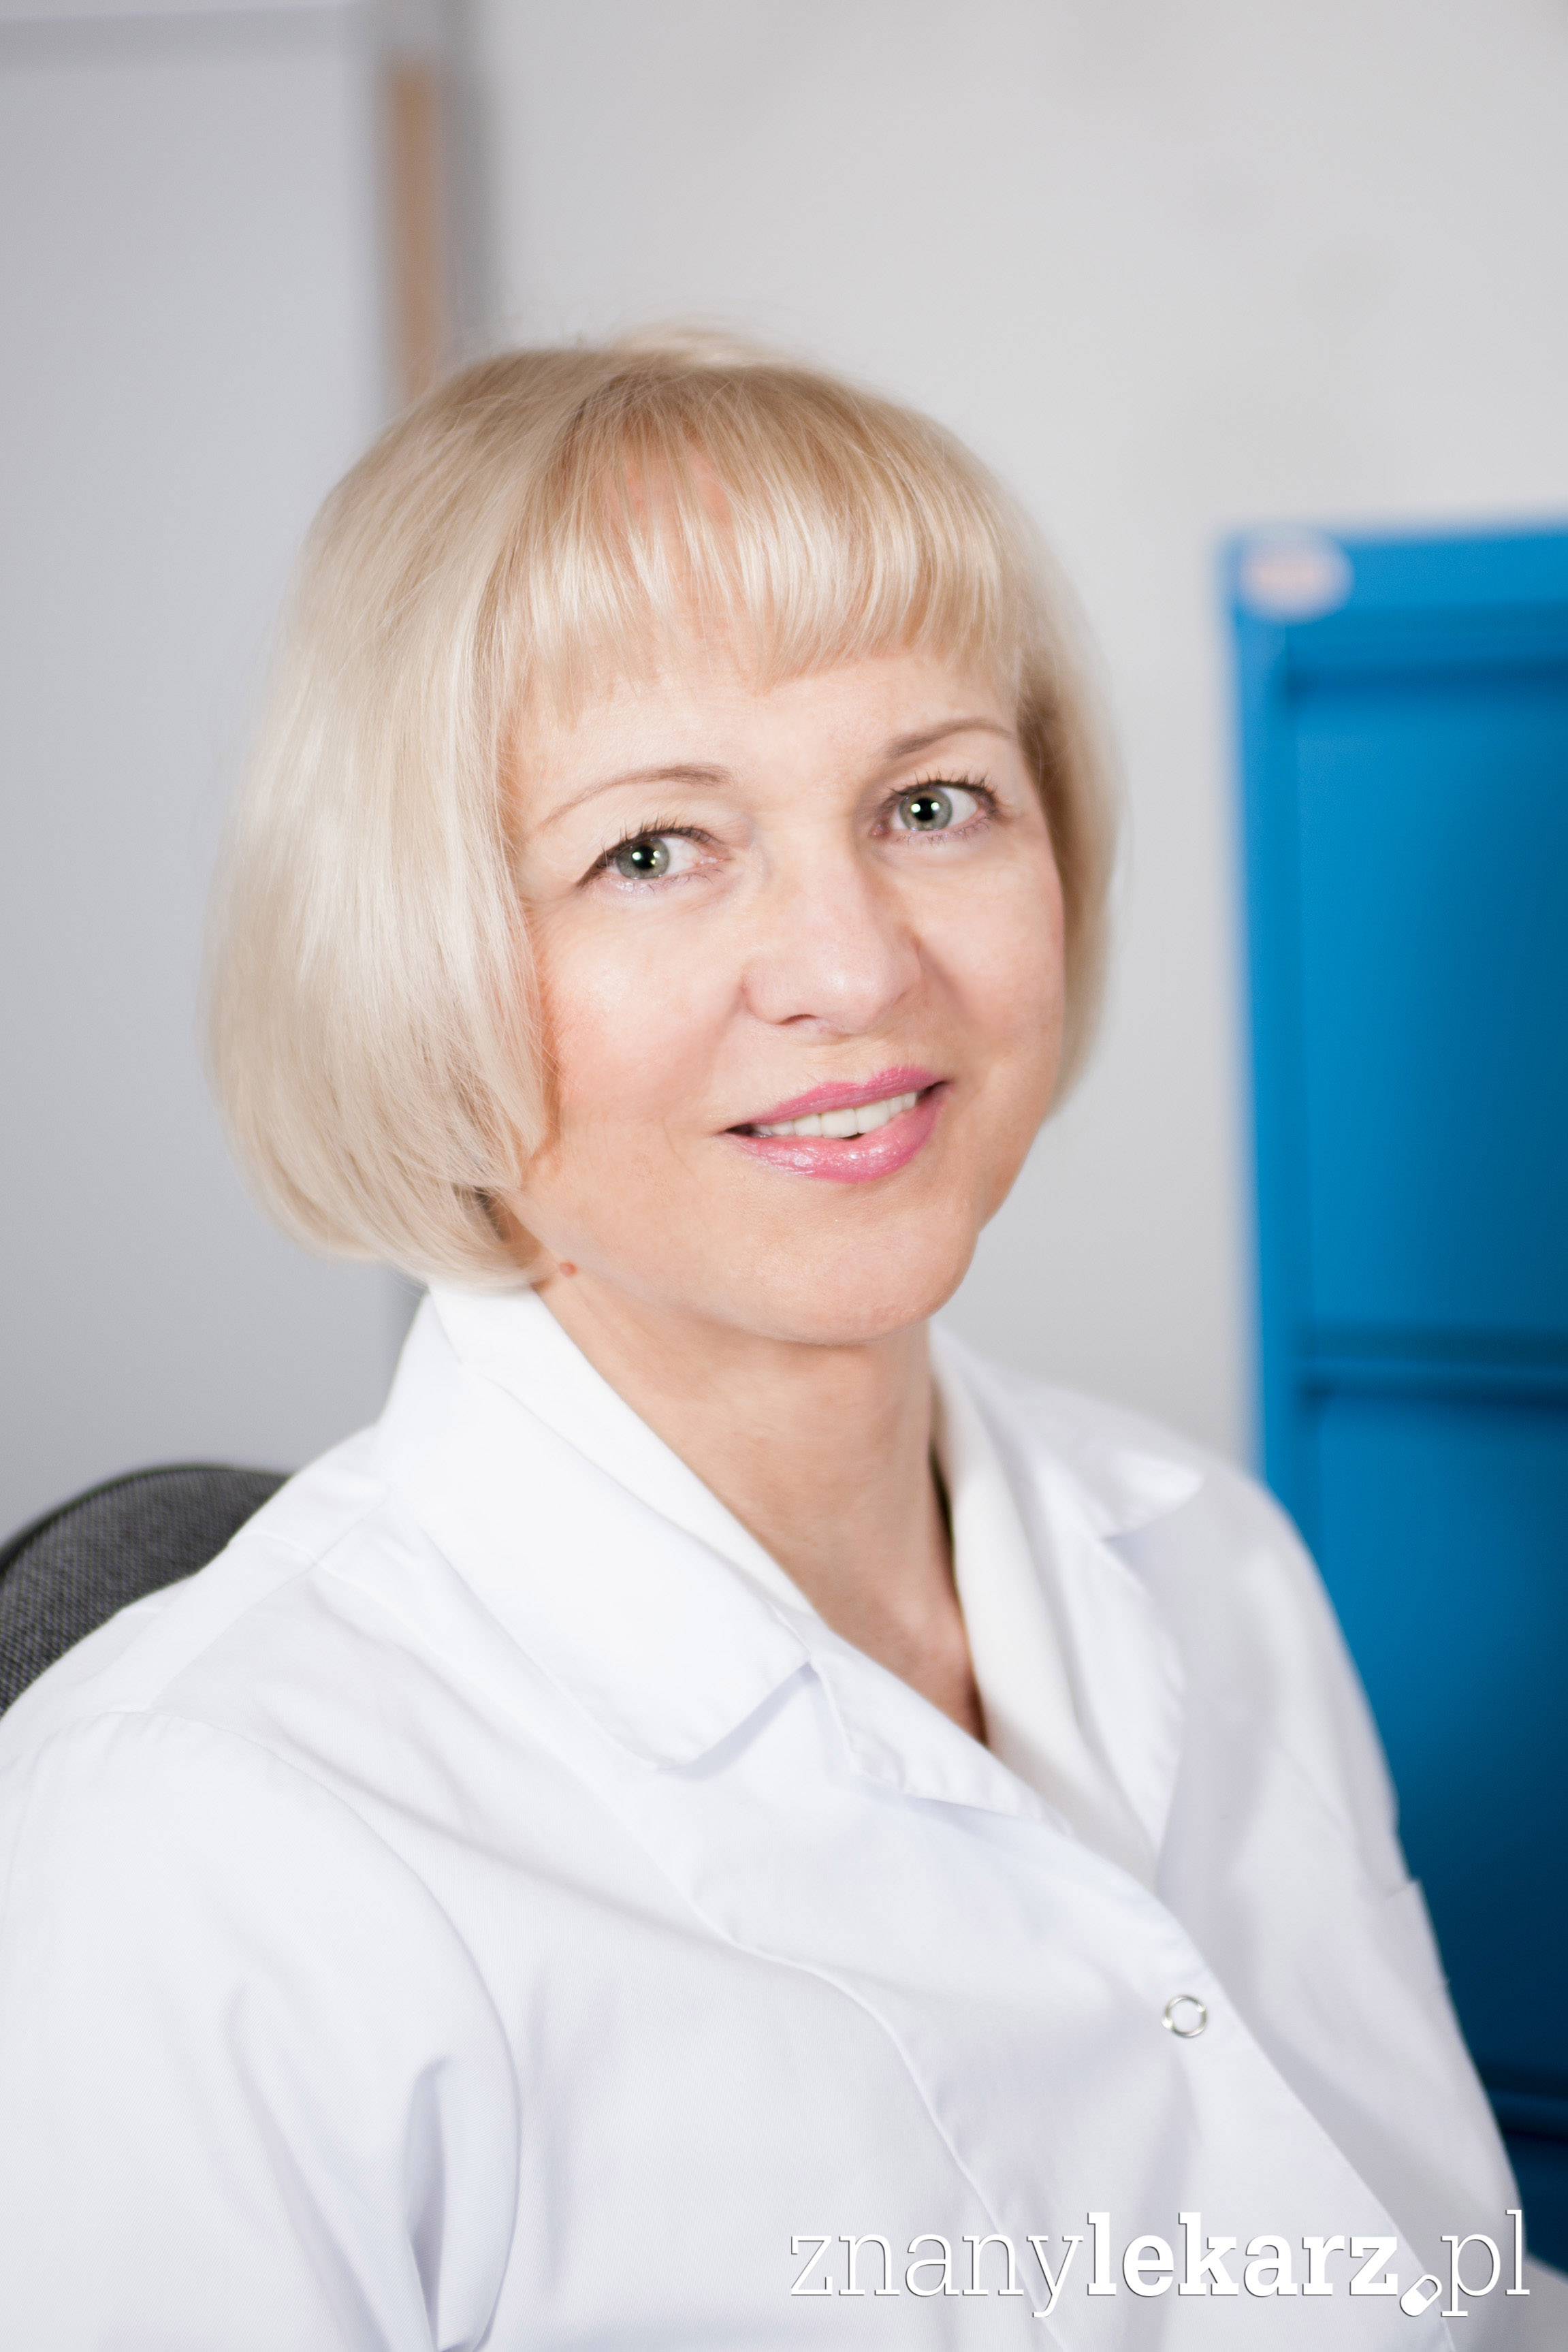 Hanna Kalotka-Kreglewska